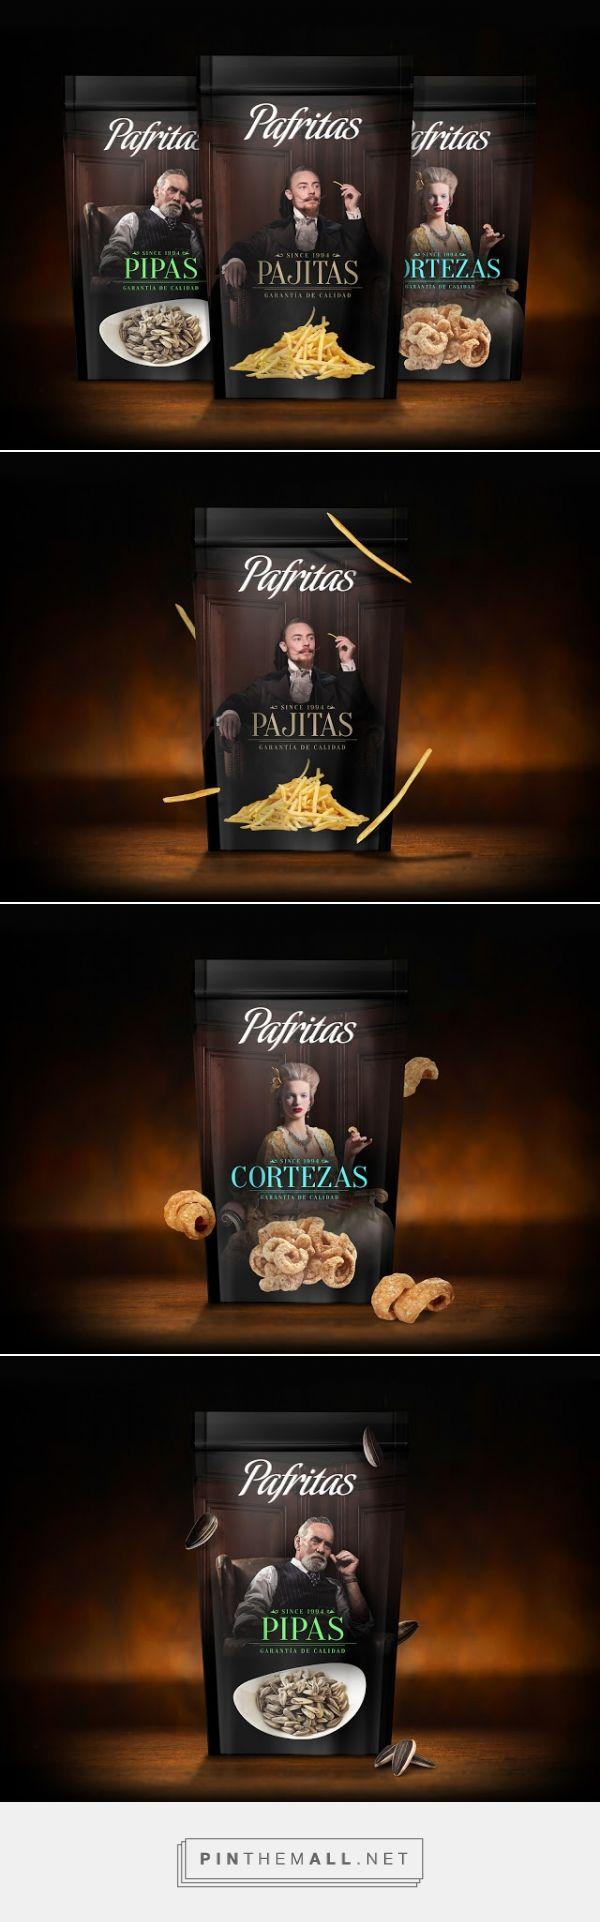 Royal Pafritas crisps #packaging designed by grantipo - http://www.packagingoftheworld.com/2015/12/royal-pafritas.html